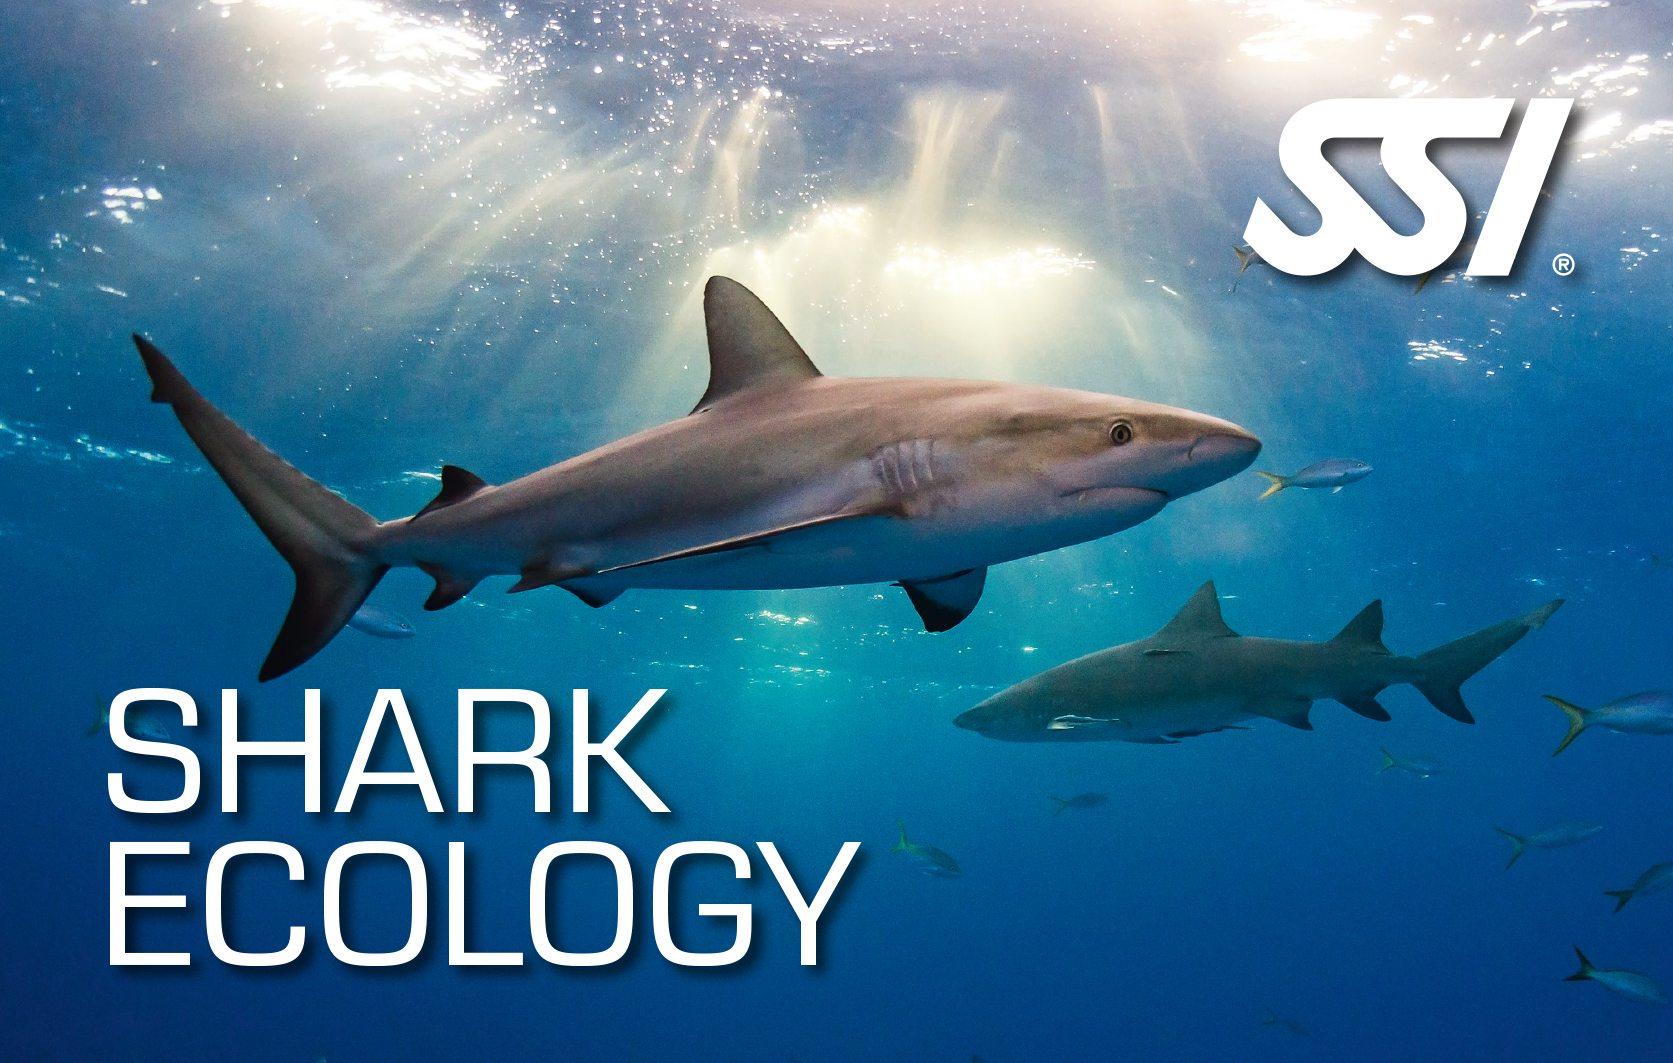 SSI Shark Ecology | SSI Shark Ecology Course | Shark Ecology | Specialty Course | Diving Course | Amazing Dive